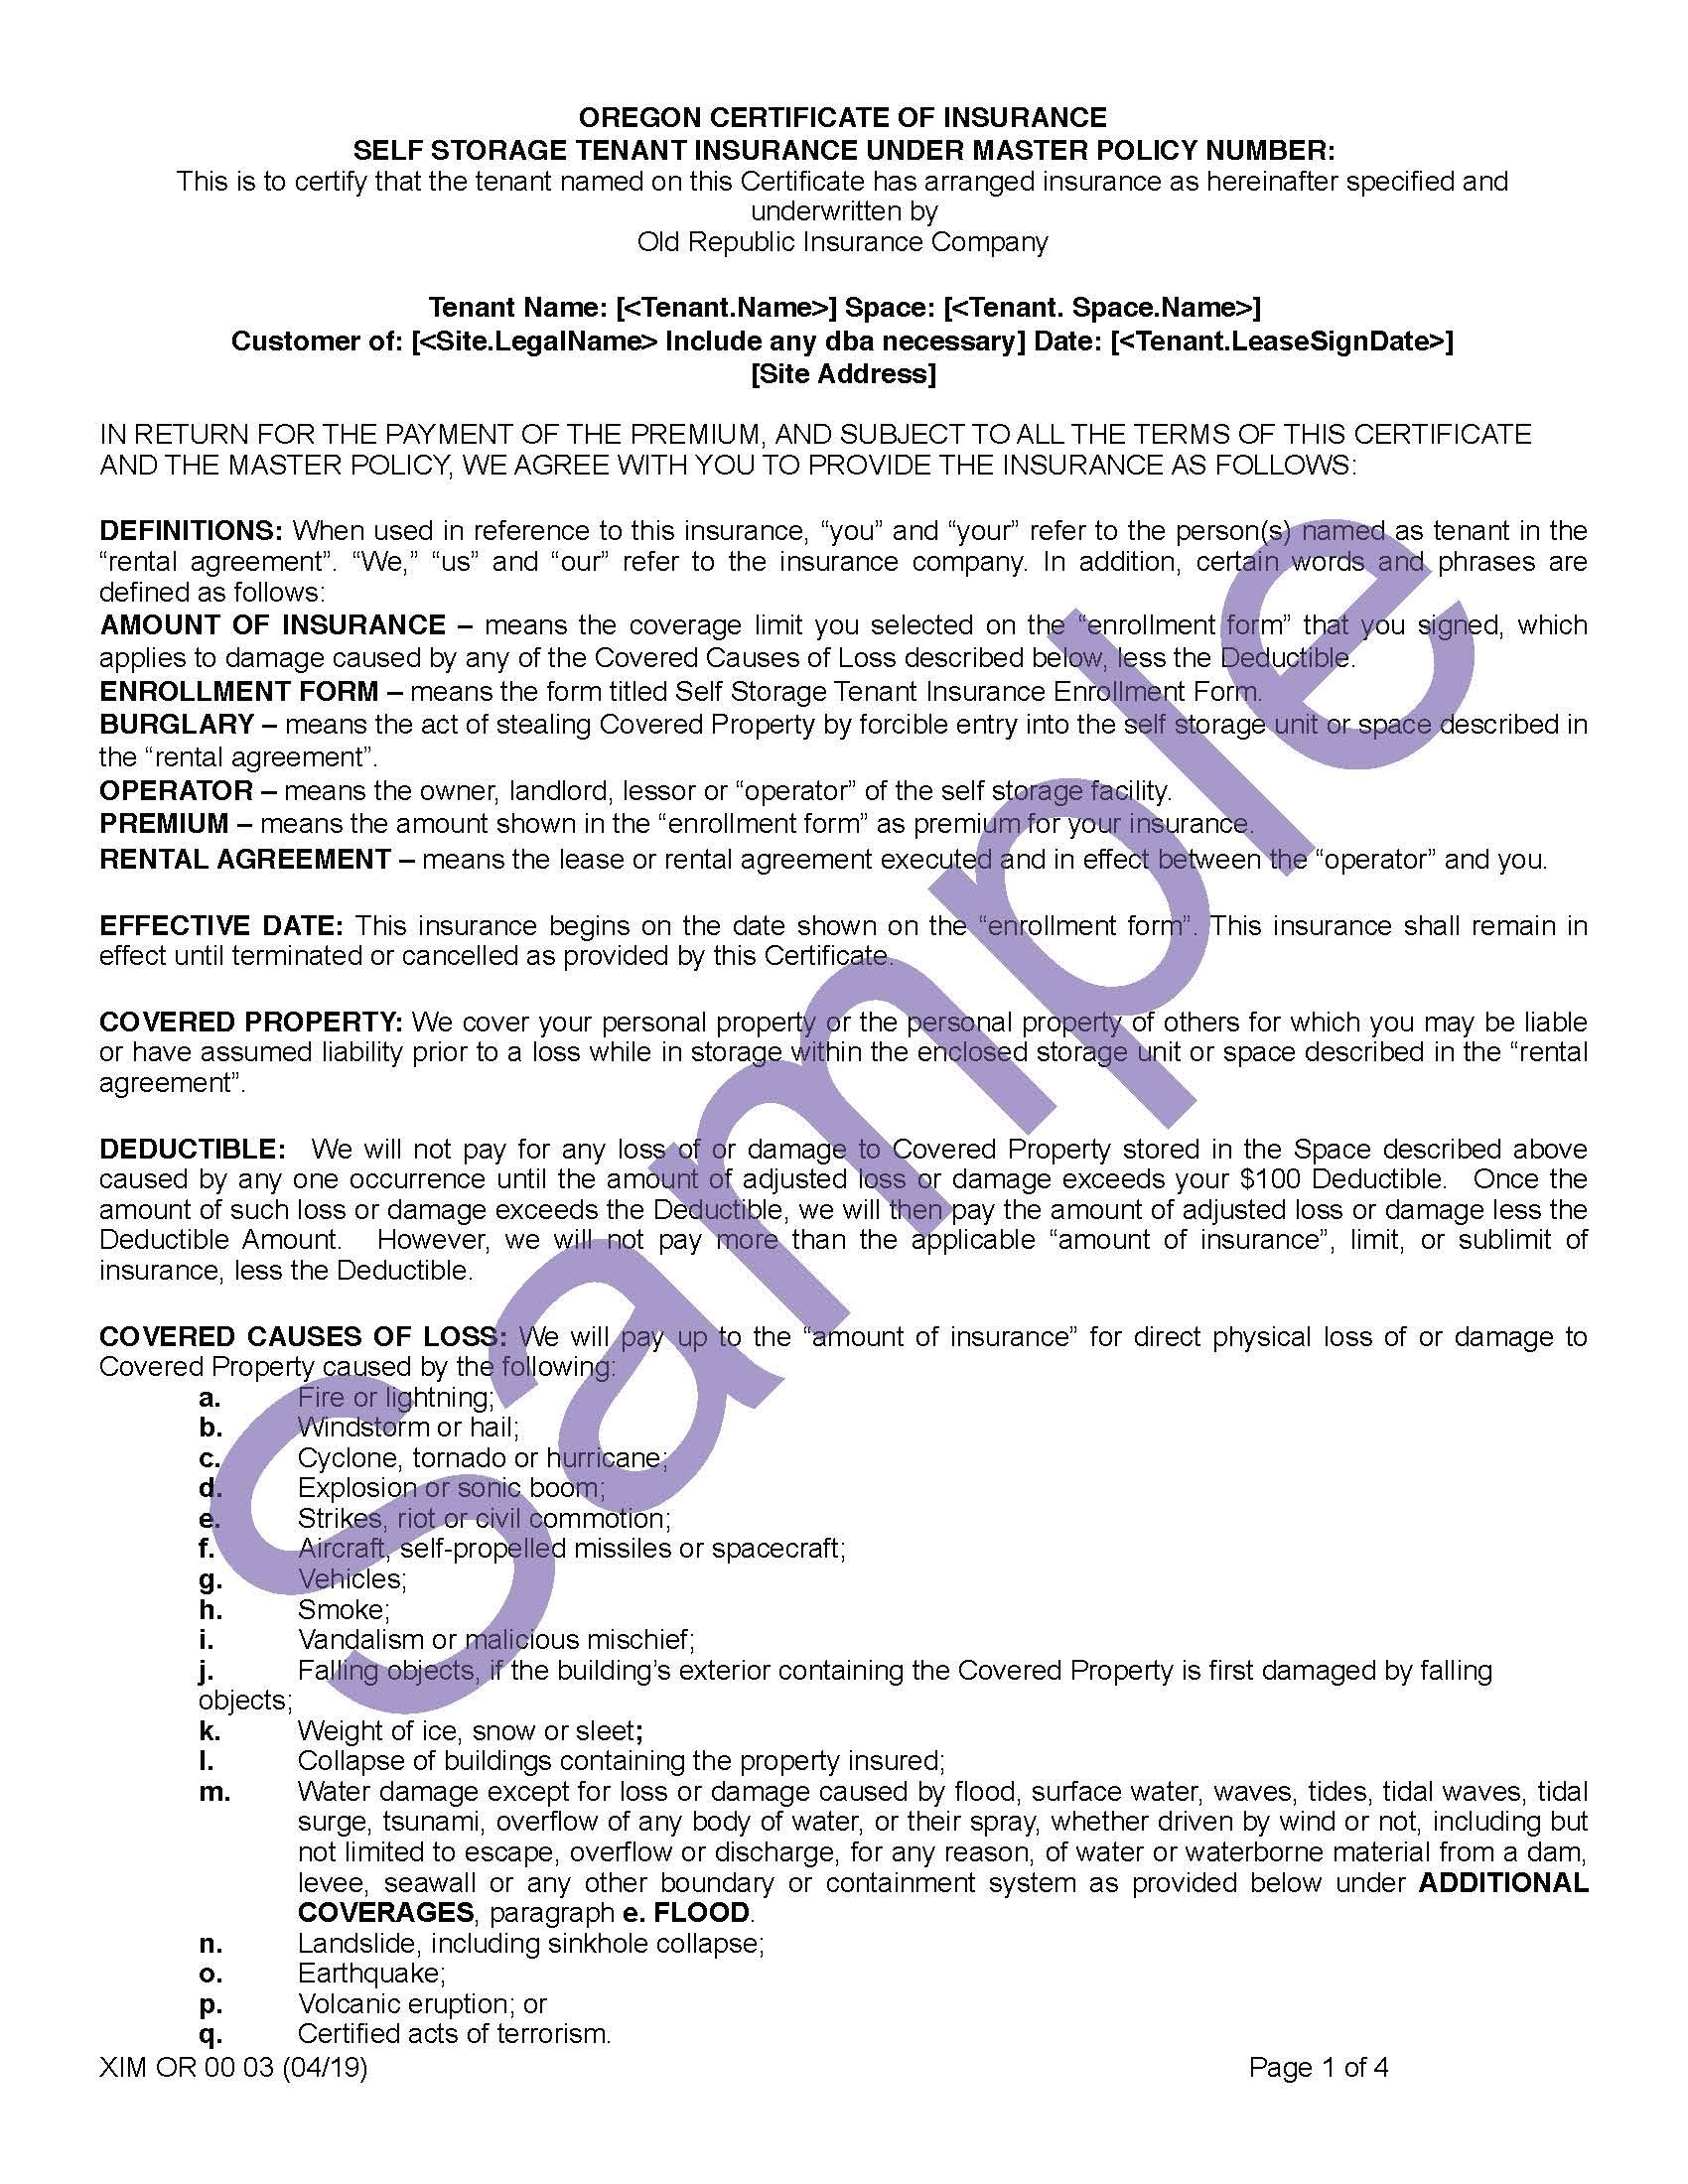 XIM OR 00 03 04 19 Oregon Certificate of InsuranceSample_Page_1.jpg